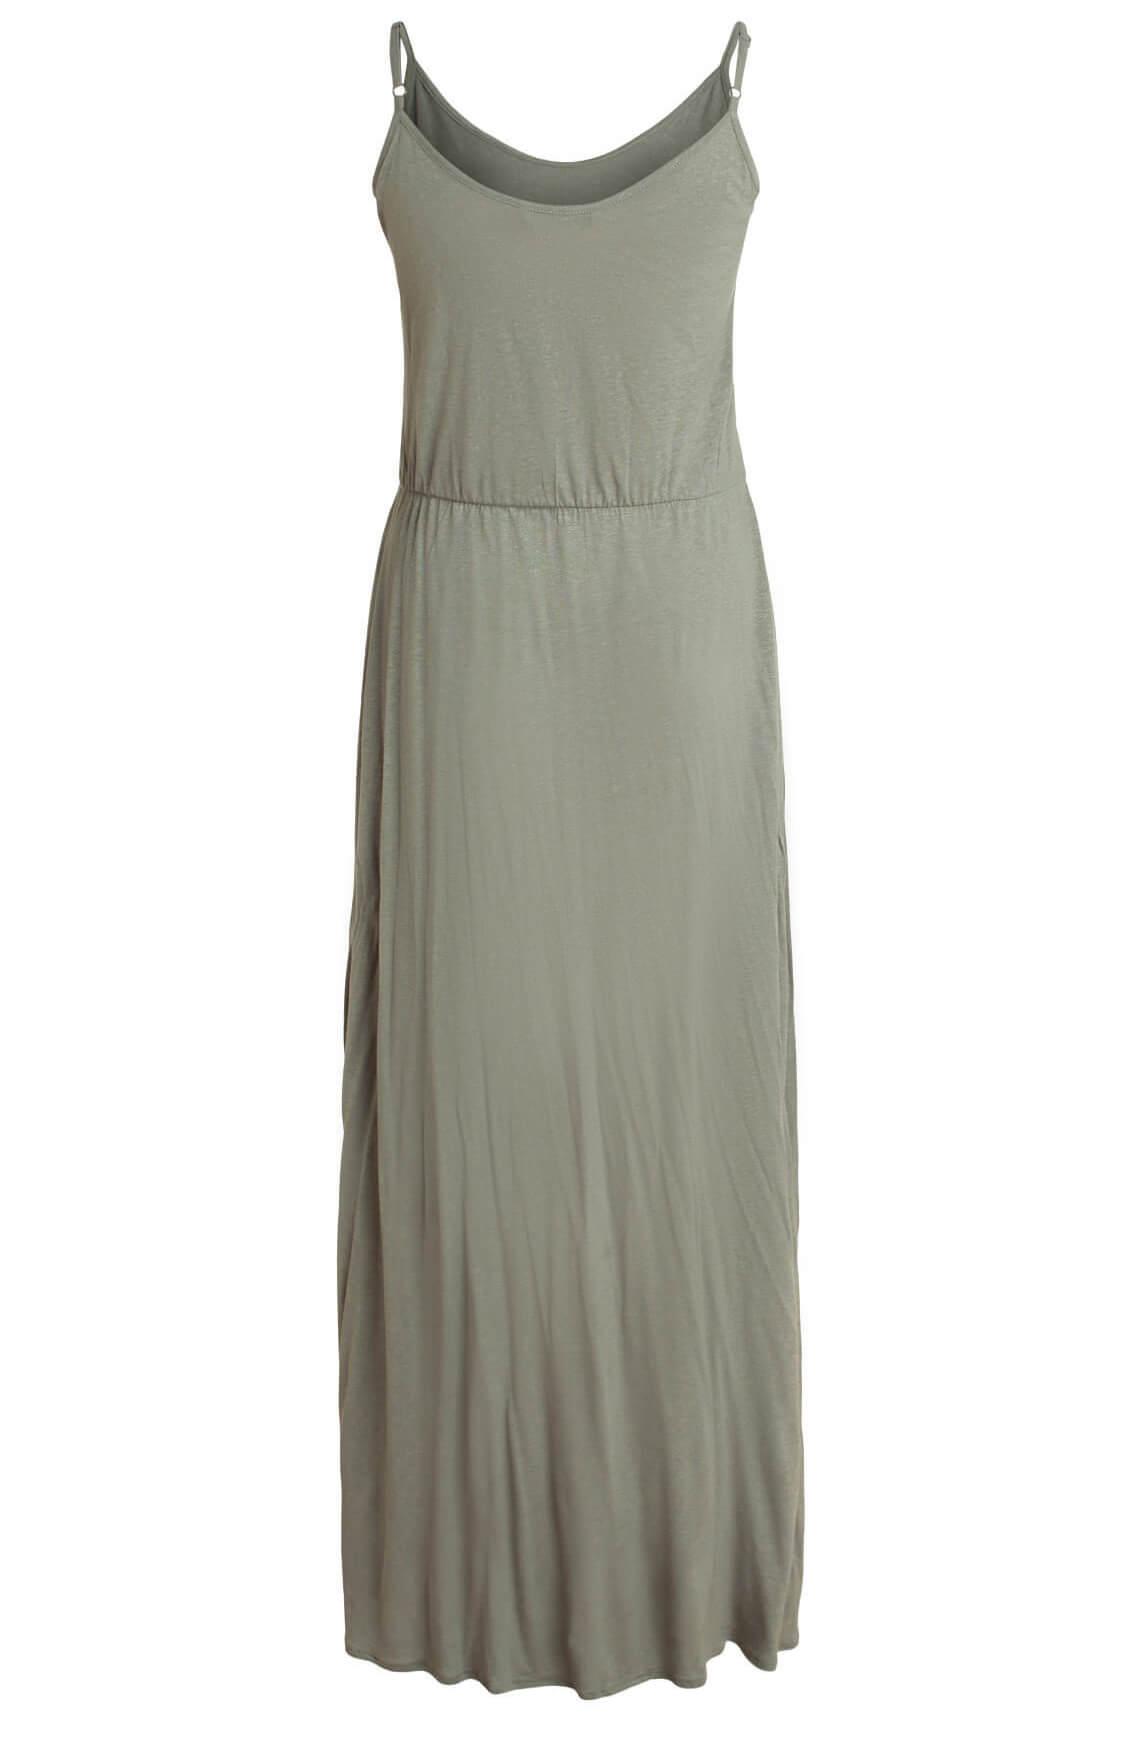 Moscow Dames Lange jurk groen